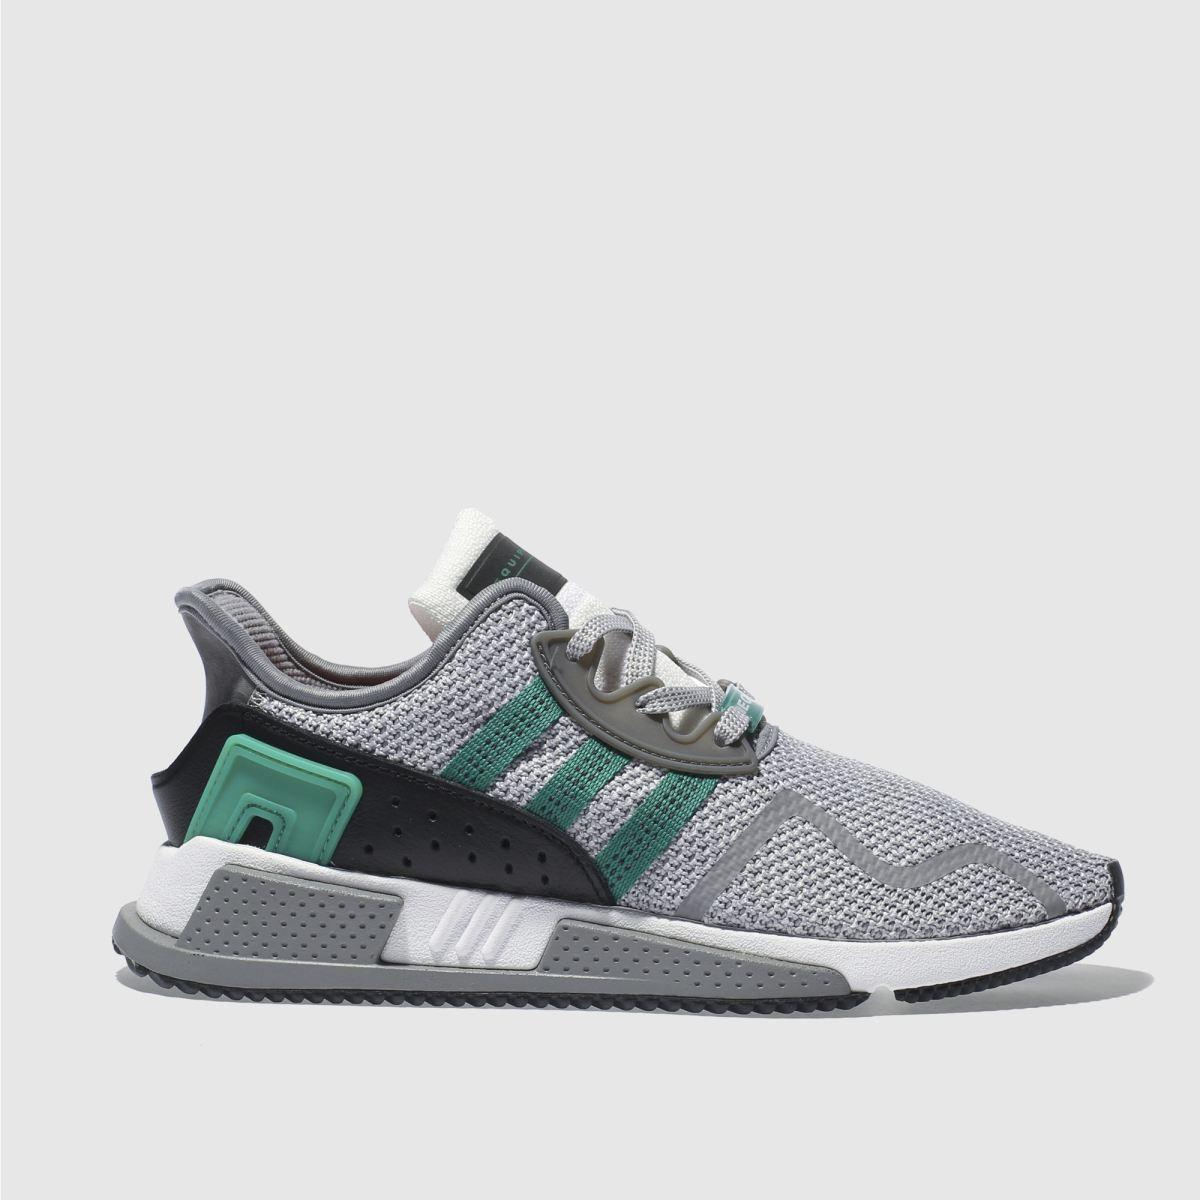 adidas light grey eqt cushion adv trainers